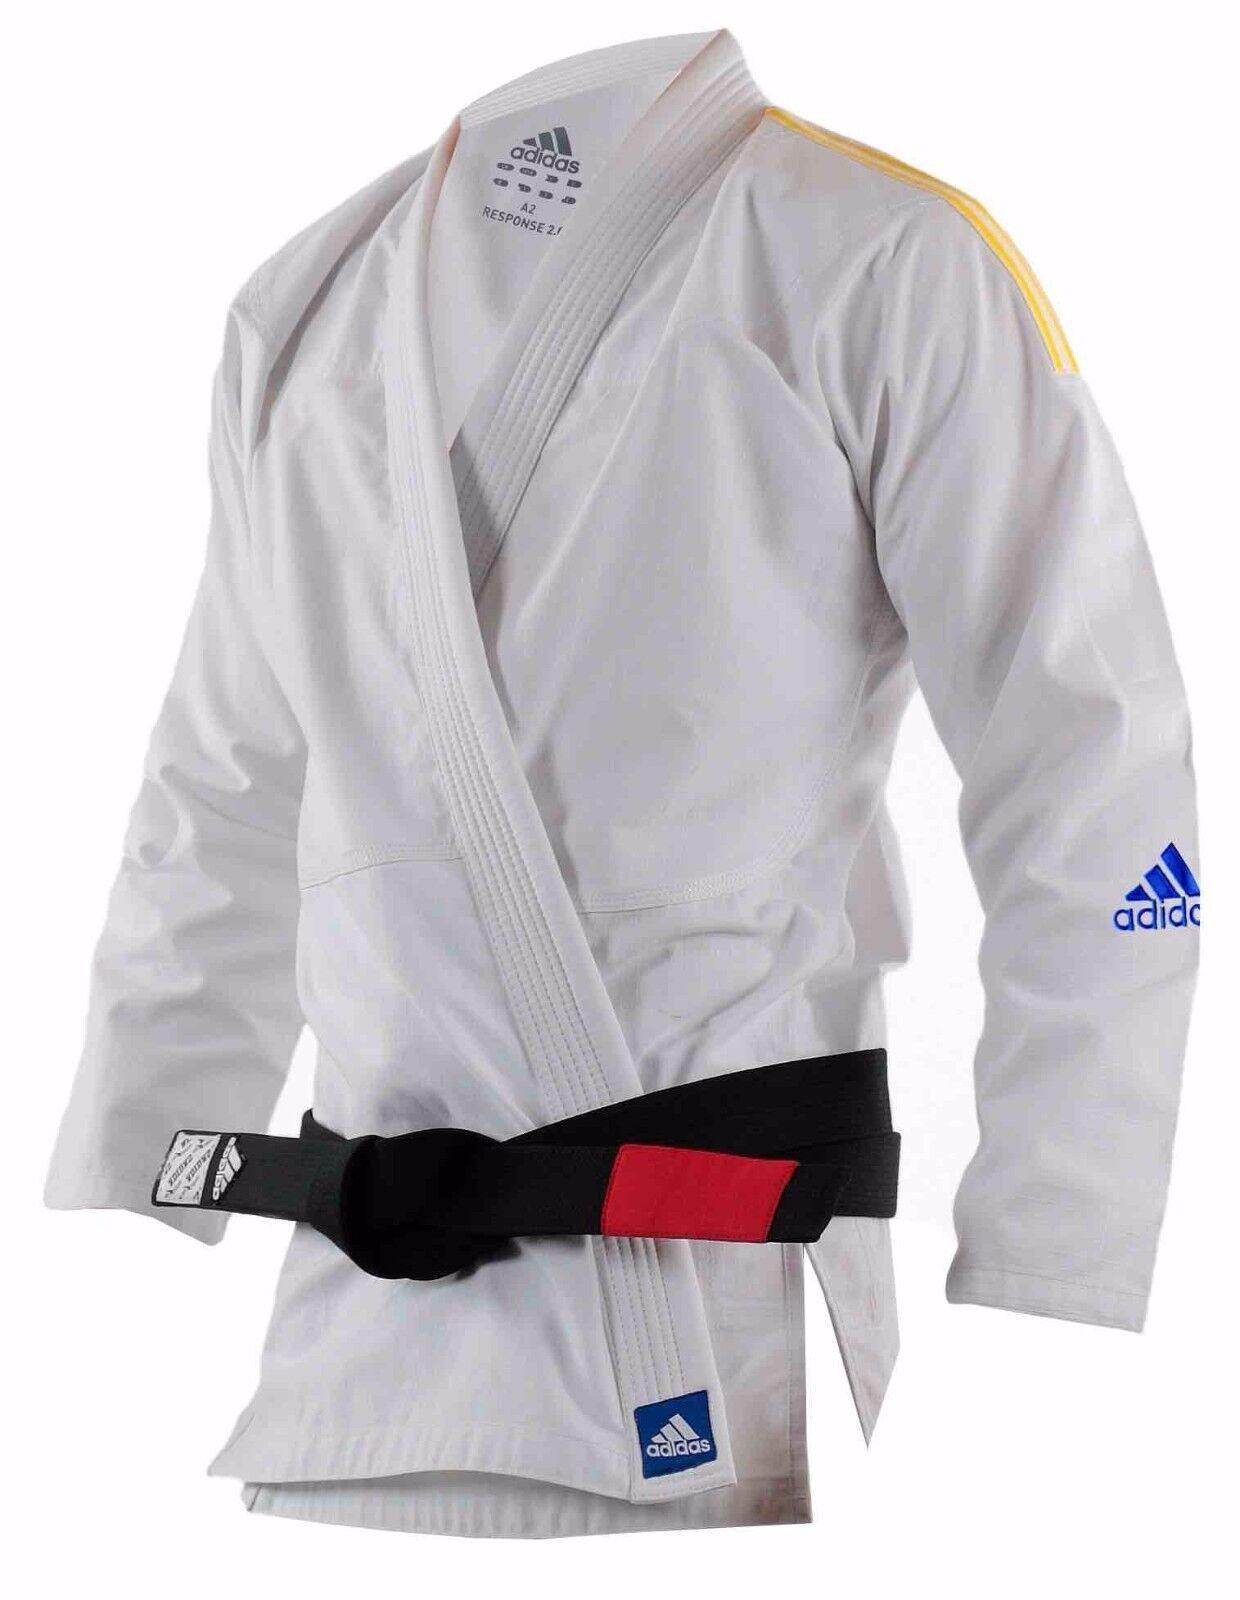 Adidas BJJ Gi Adult Kinds Brazilian Jiujitsu Suit wit A1 A2 A3 A4 M0 M2 M3